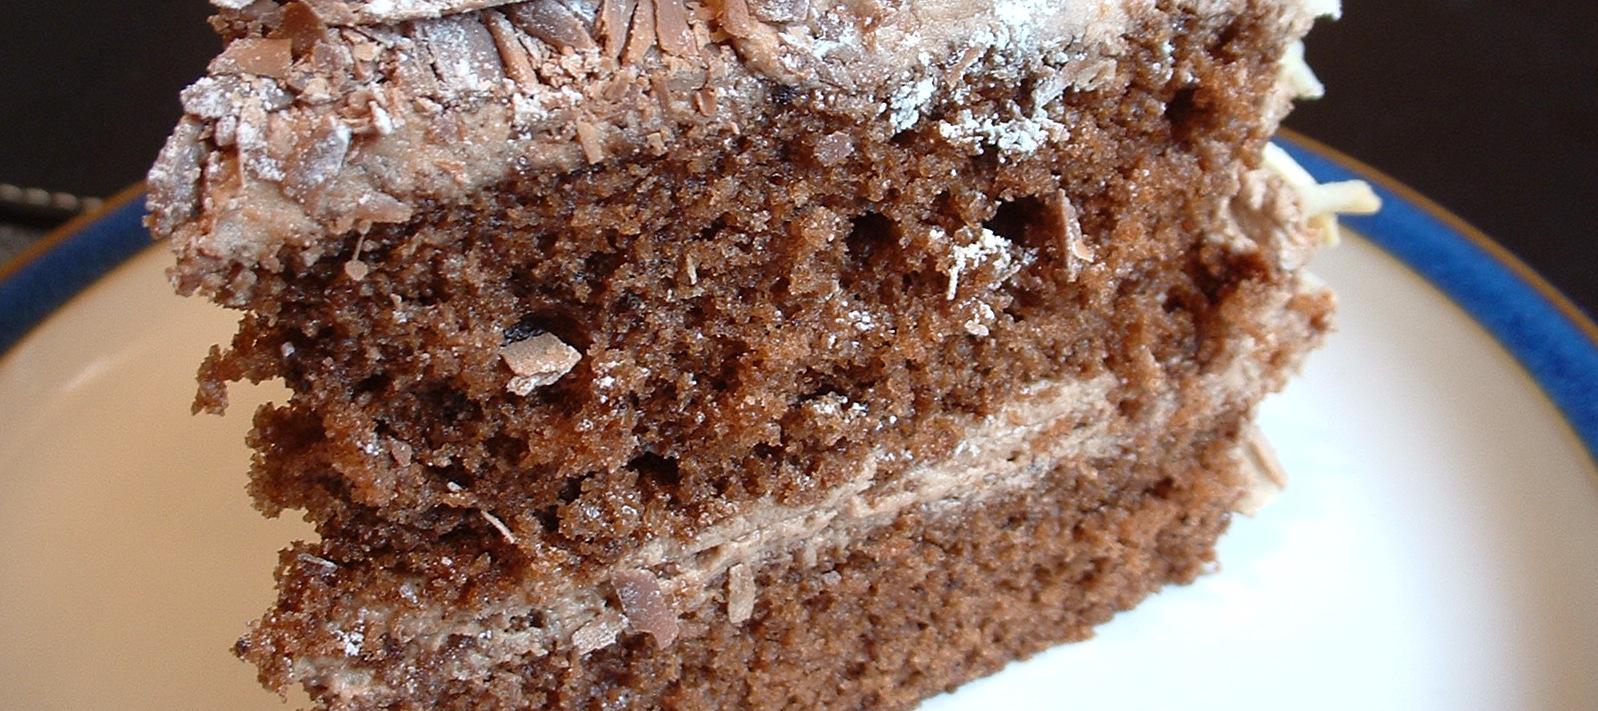 Chocolate cake recipe | Chocolate sponge cake |